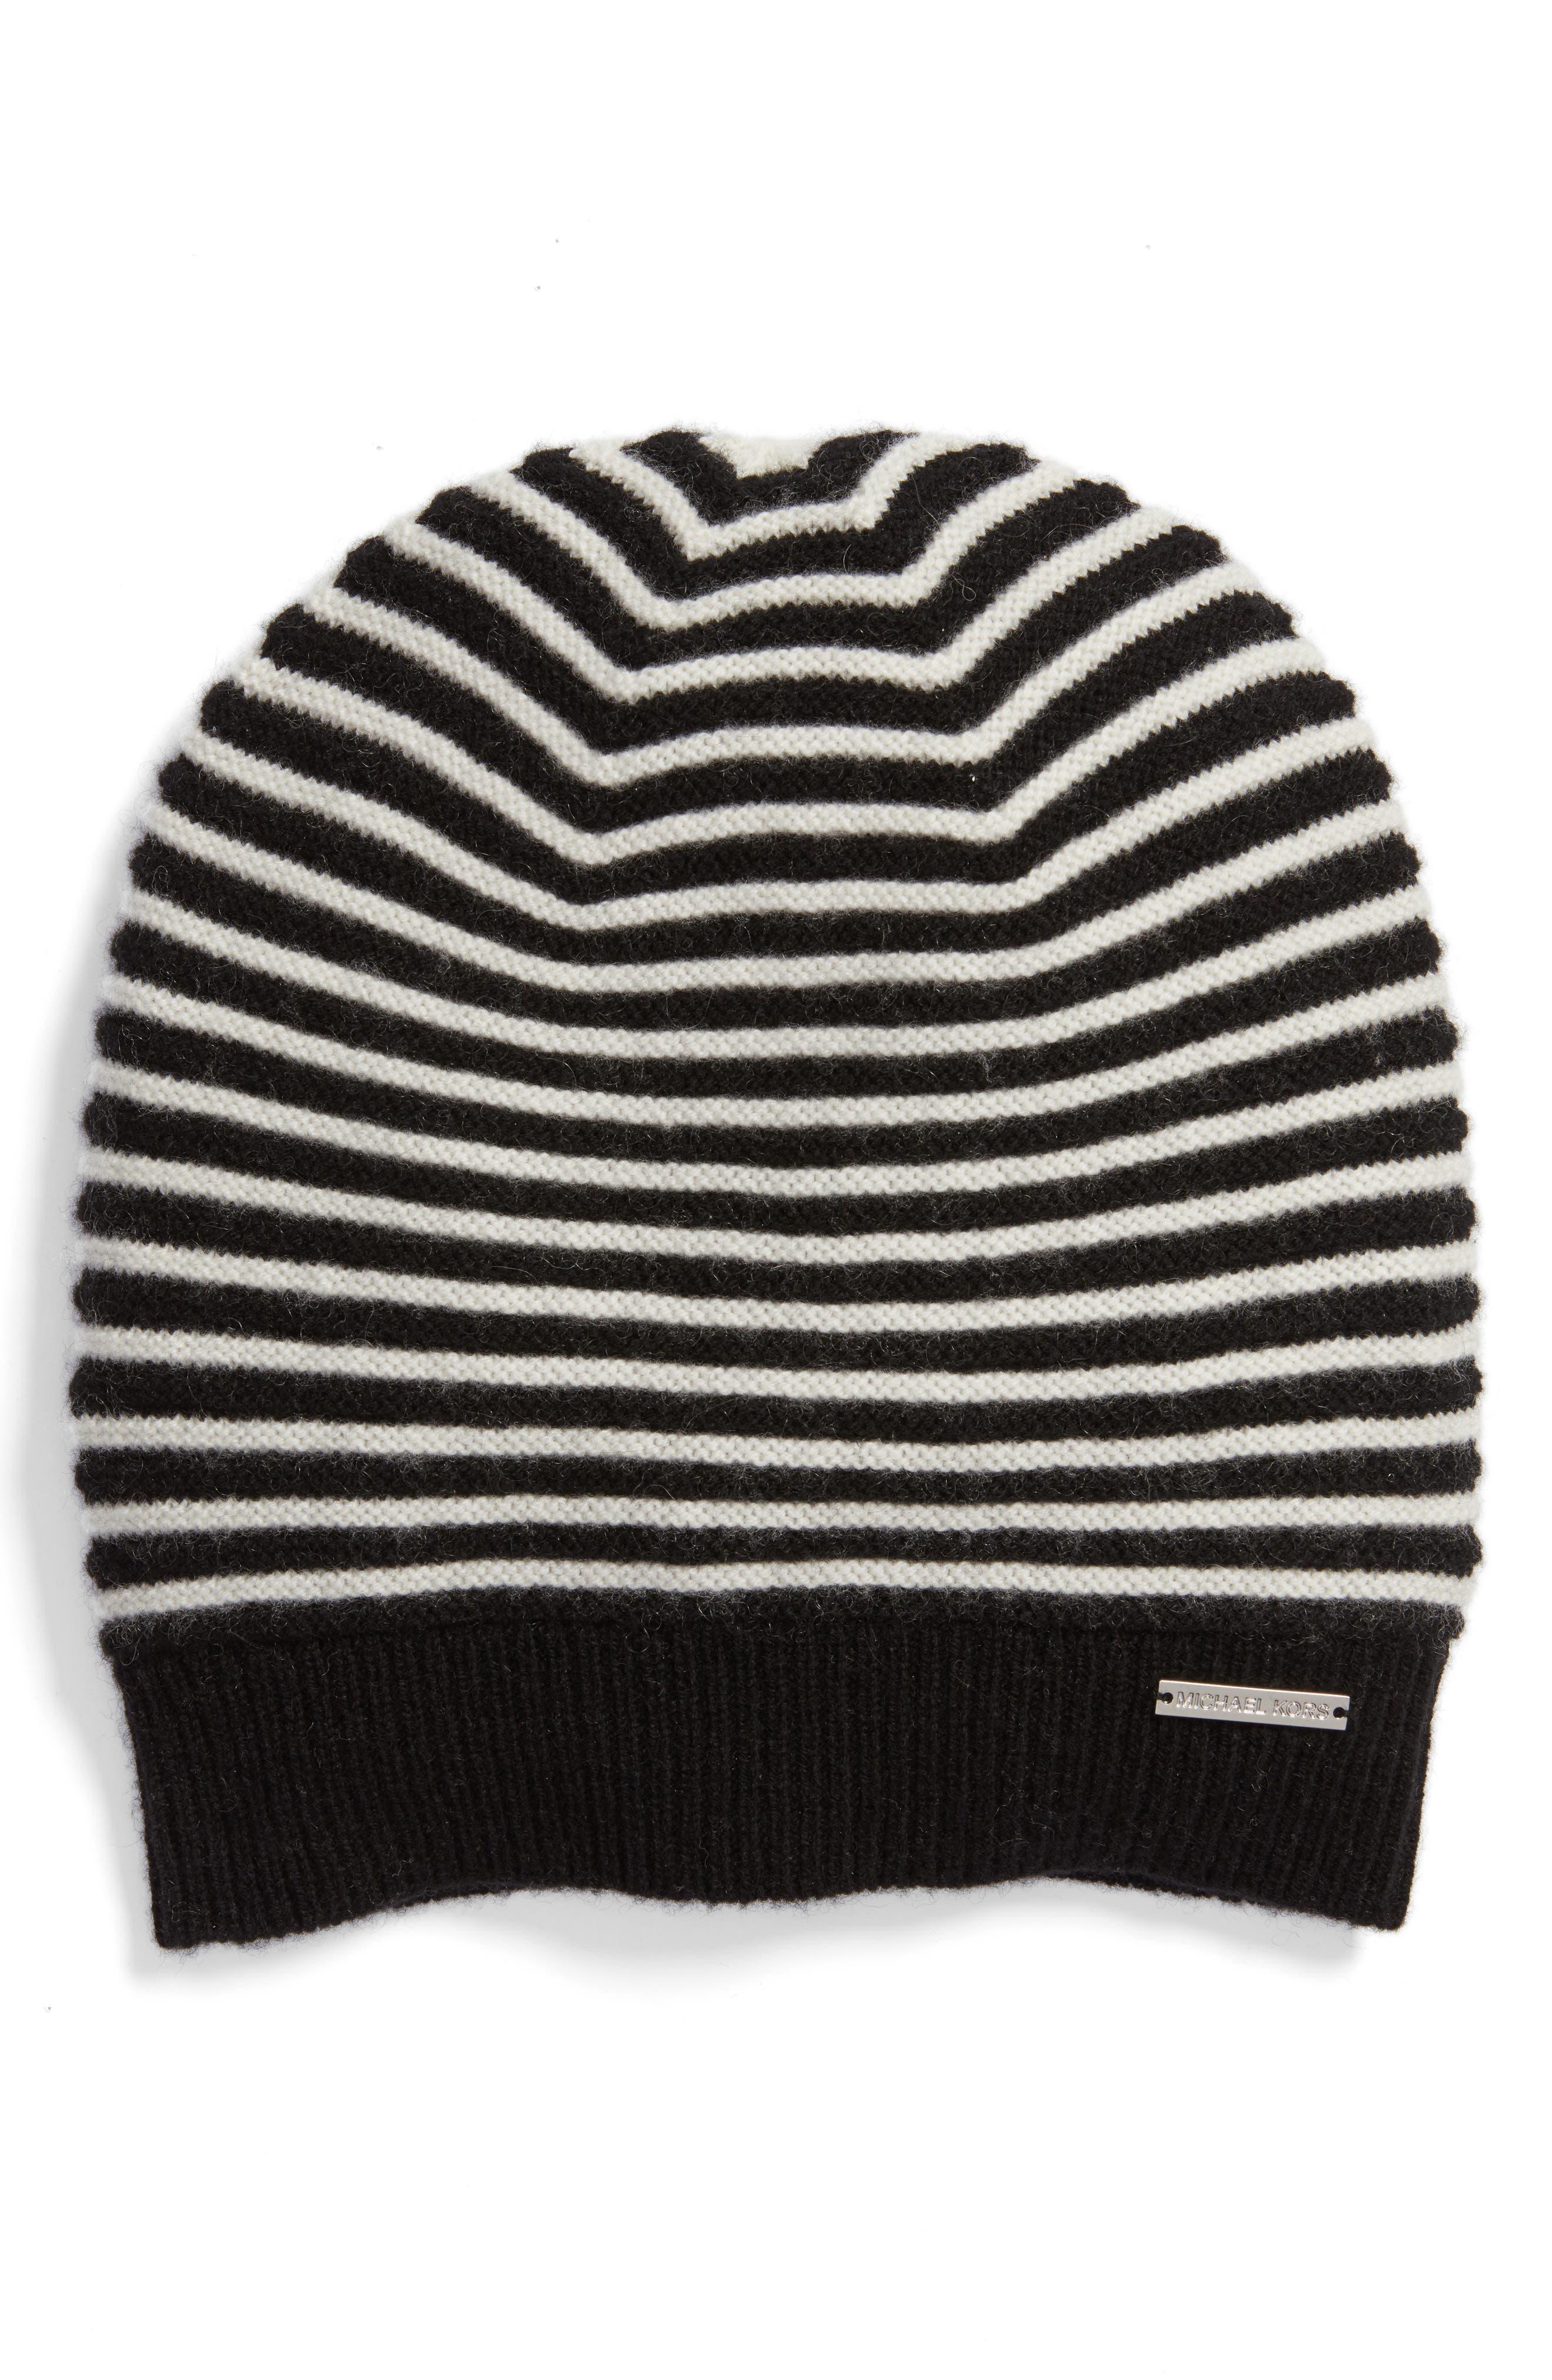 Main Image - MICHAEL Michael Kors Double Links Wool & Cashmere Hat